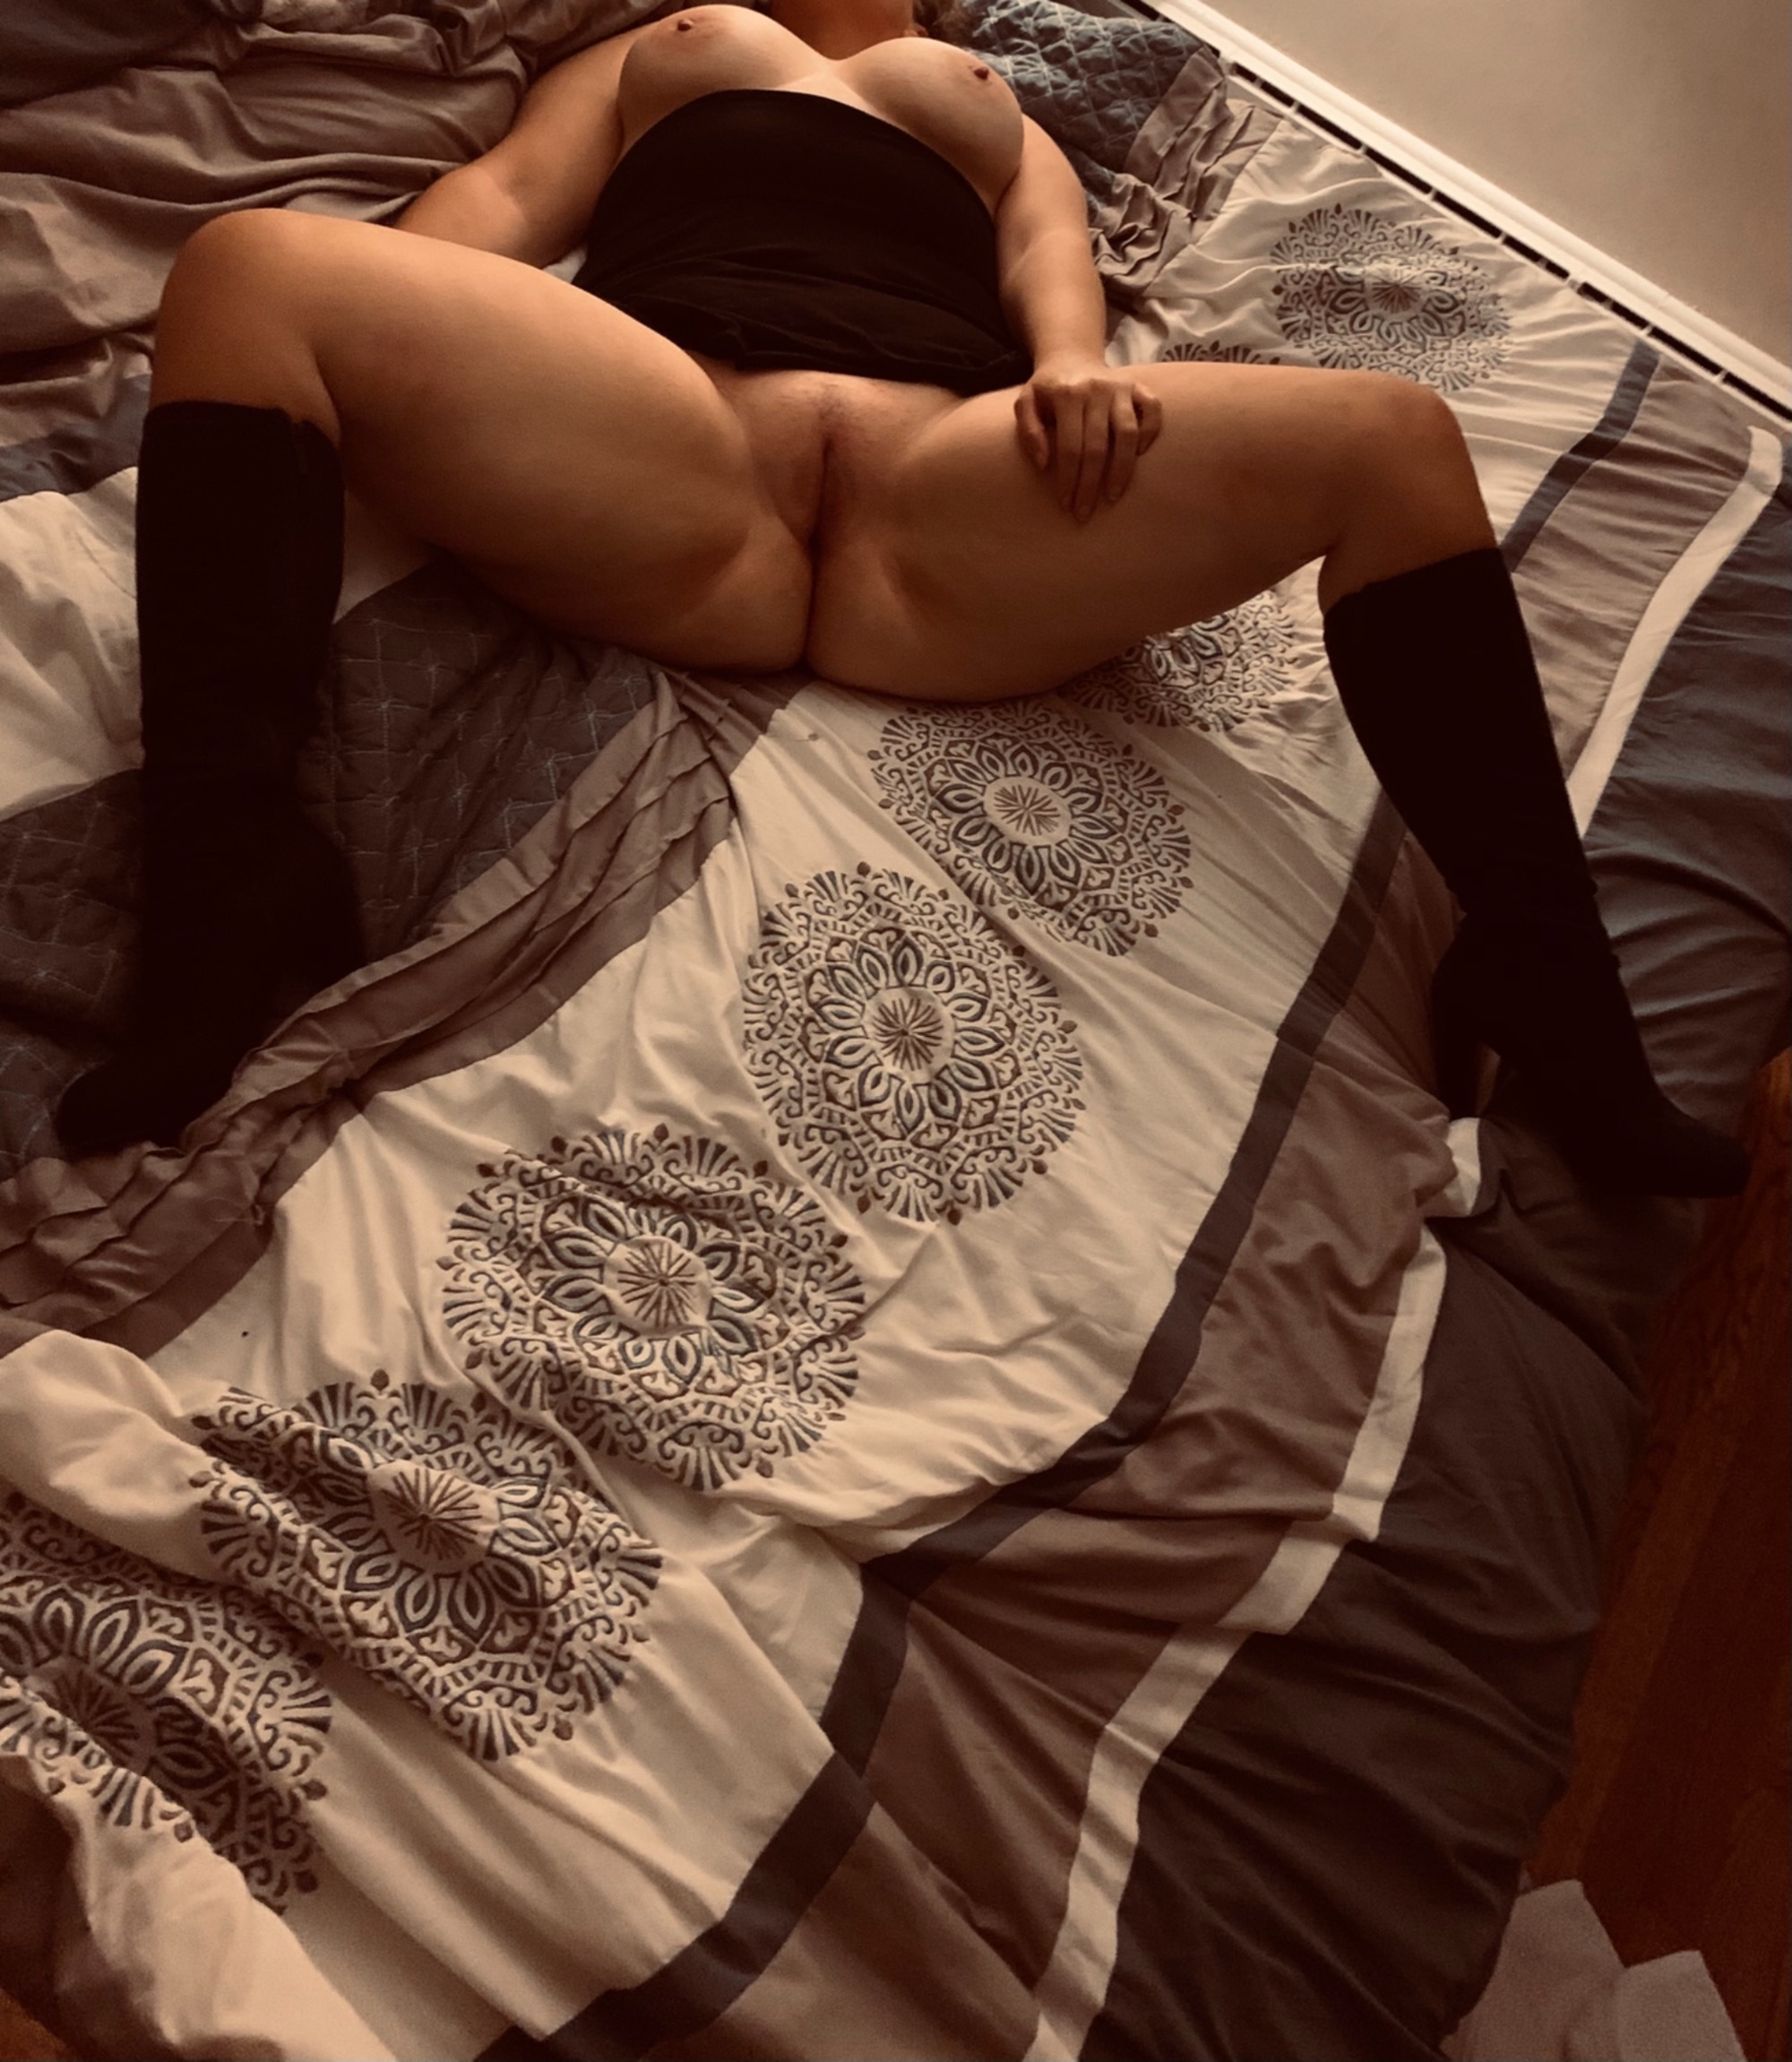 Marcela Milf, Onlyfans, 0018